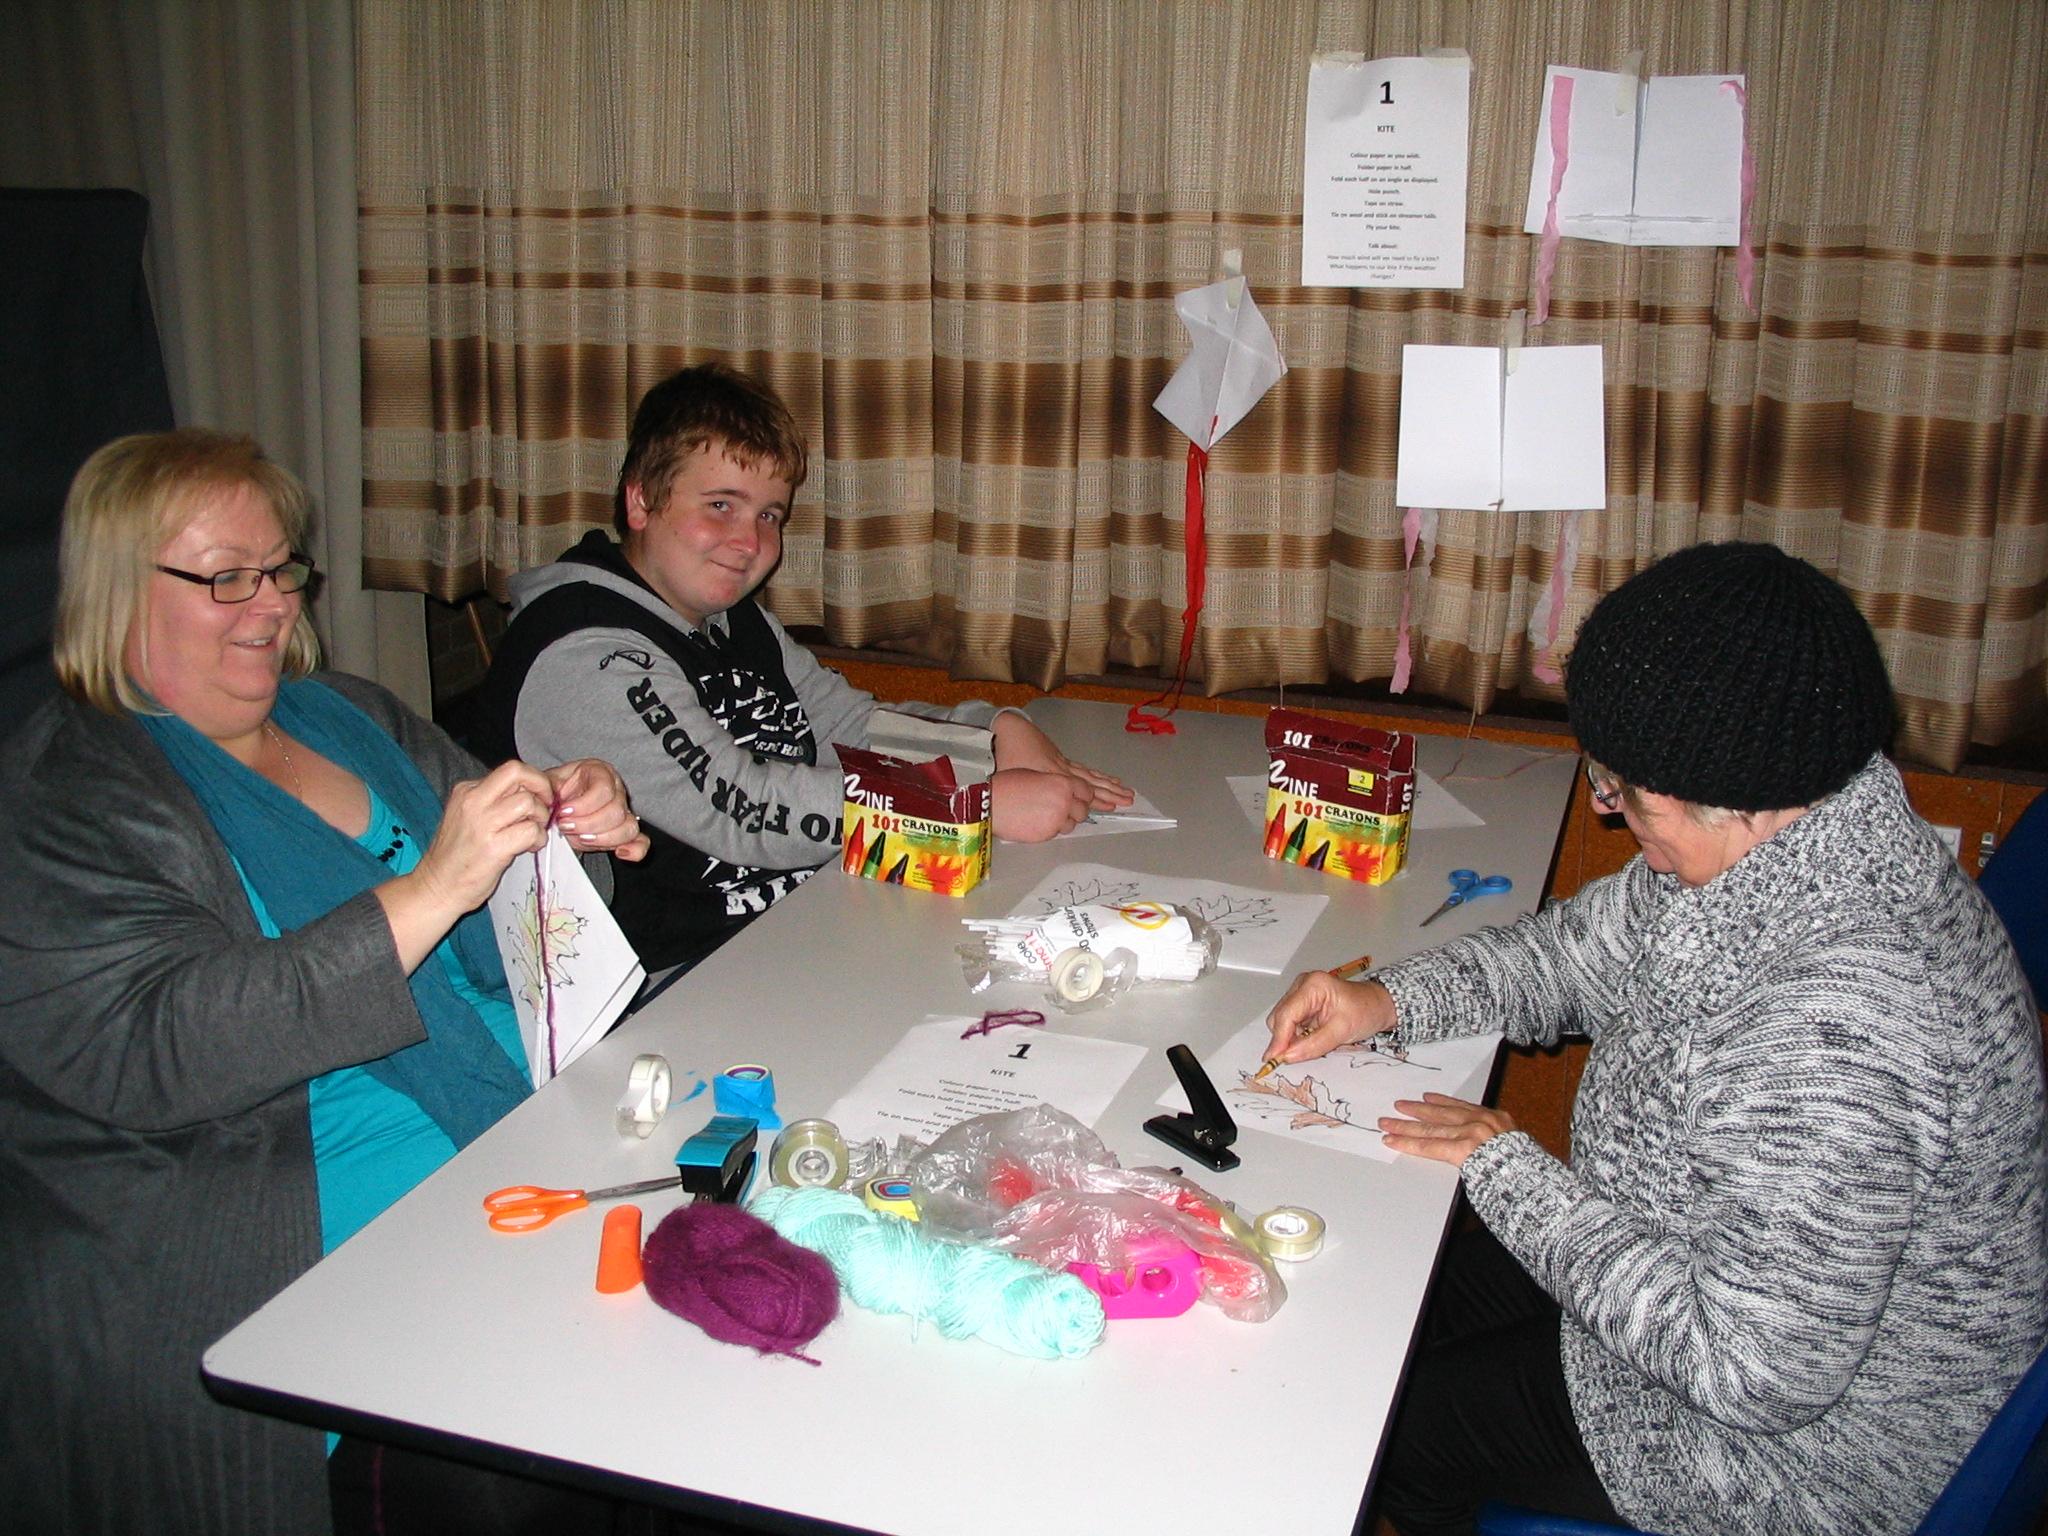 Julie, Riley & Denise making kites